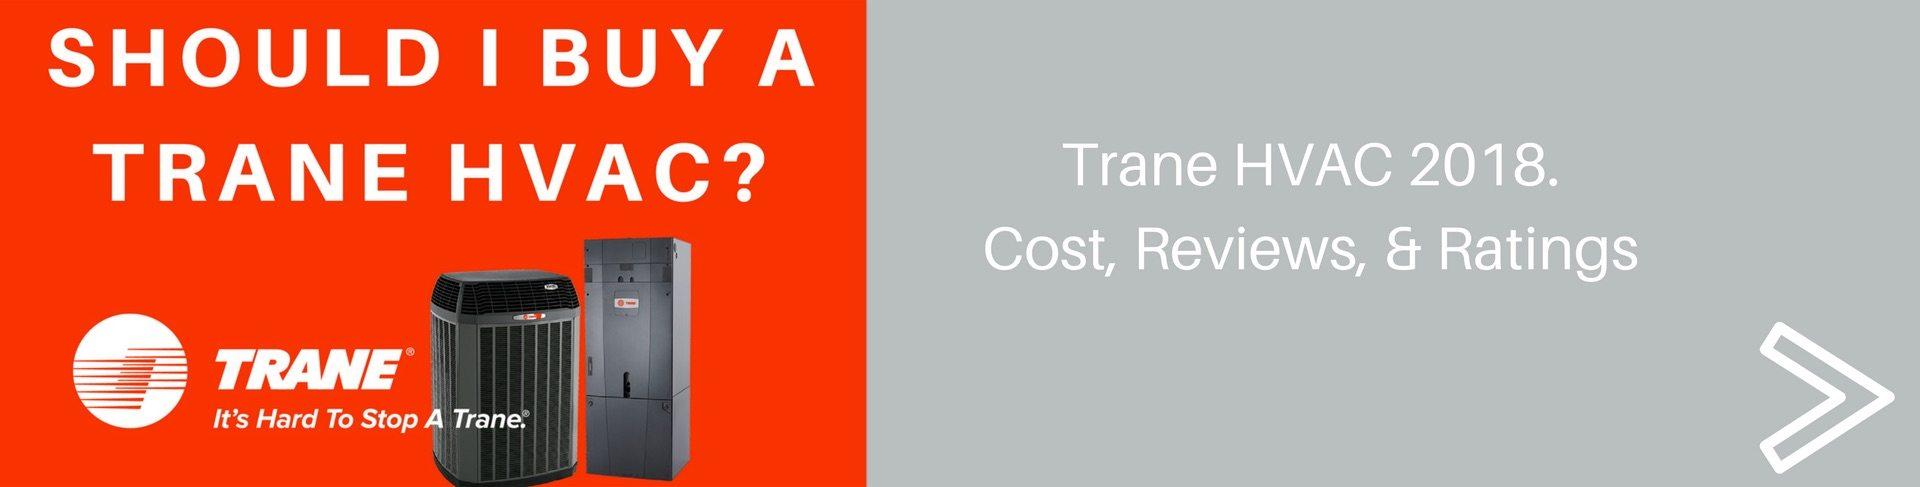 Trane-HVAC-System-Cost